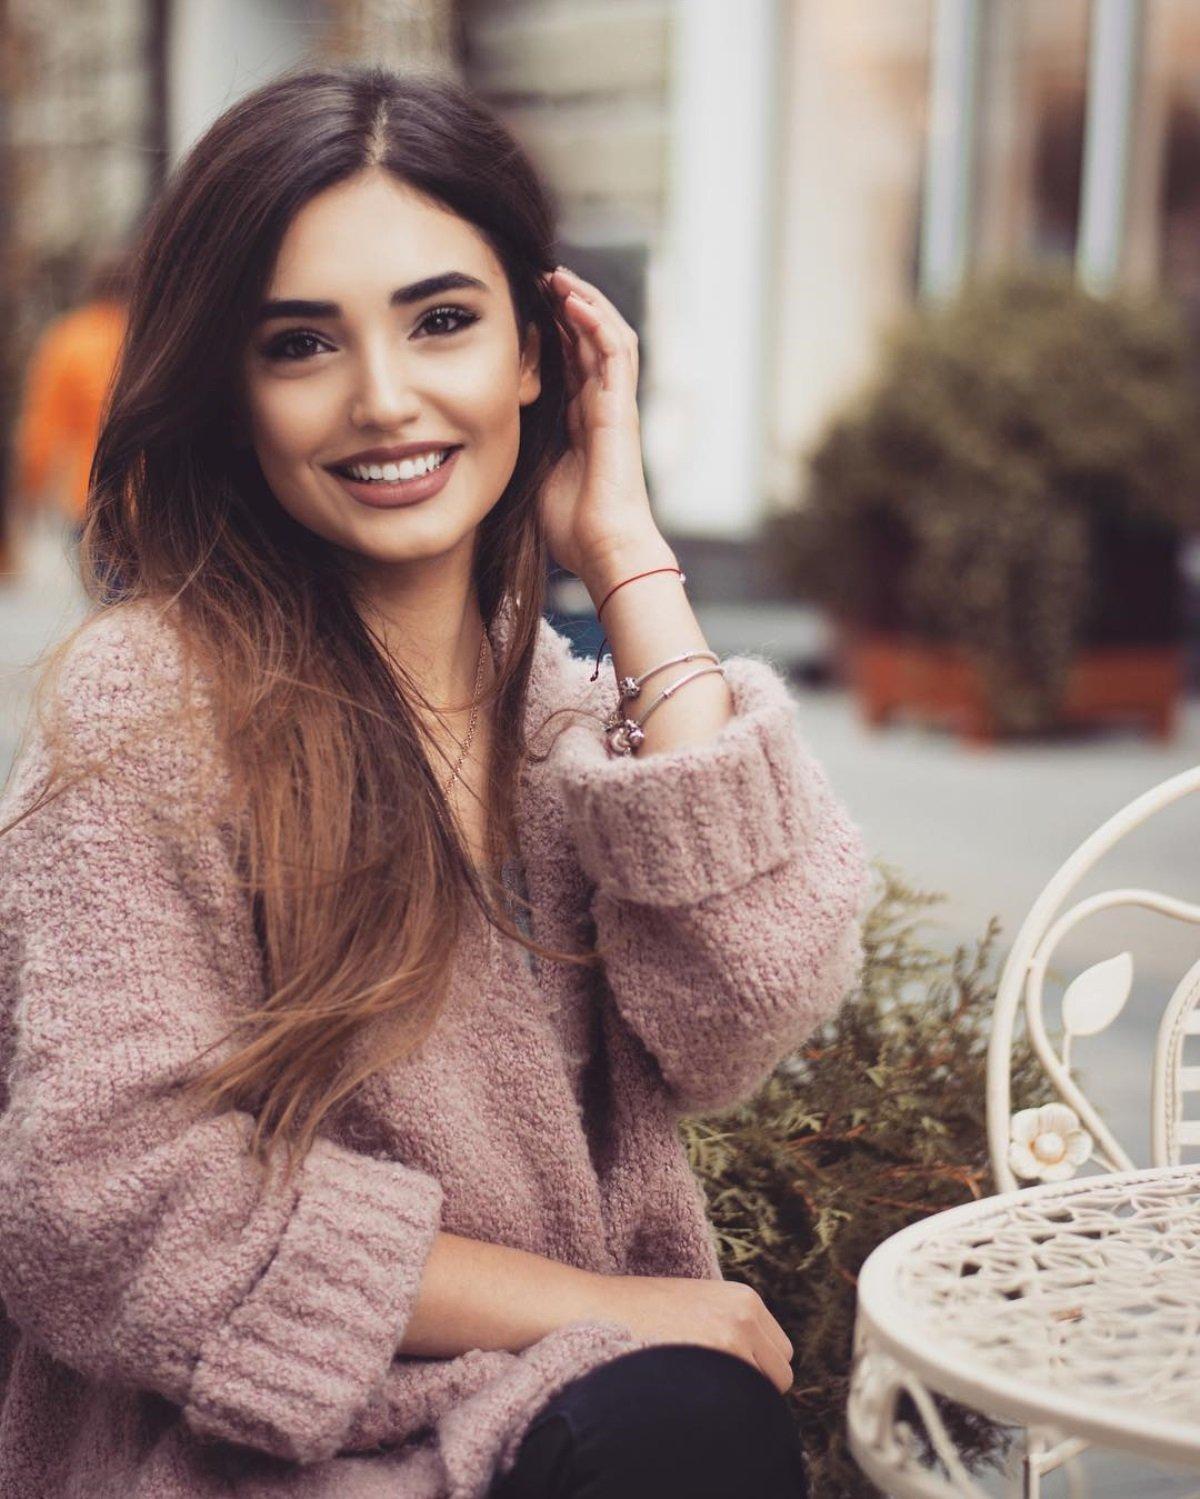 Красивые армянки картинки